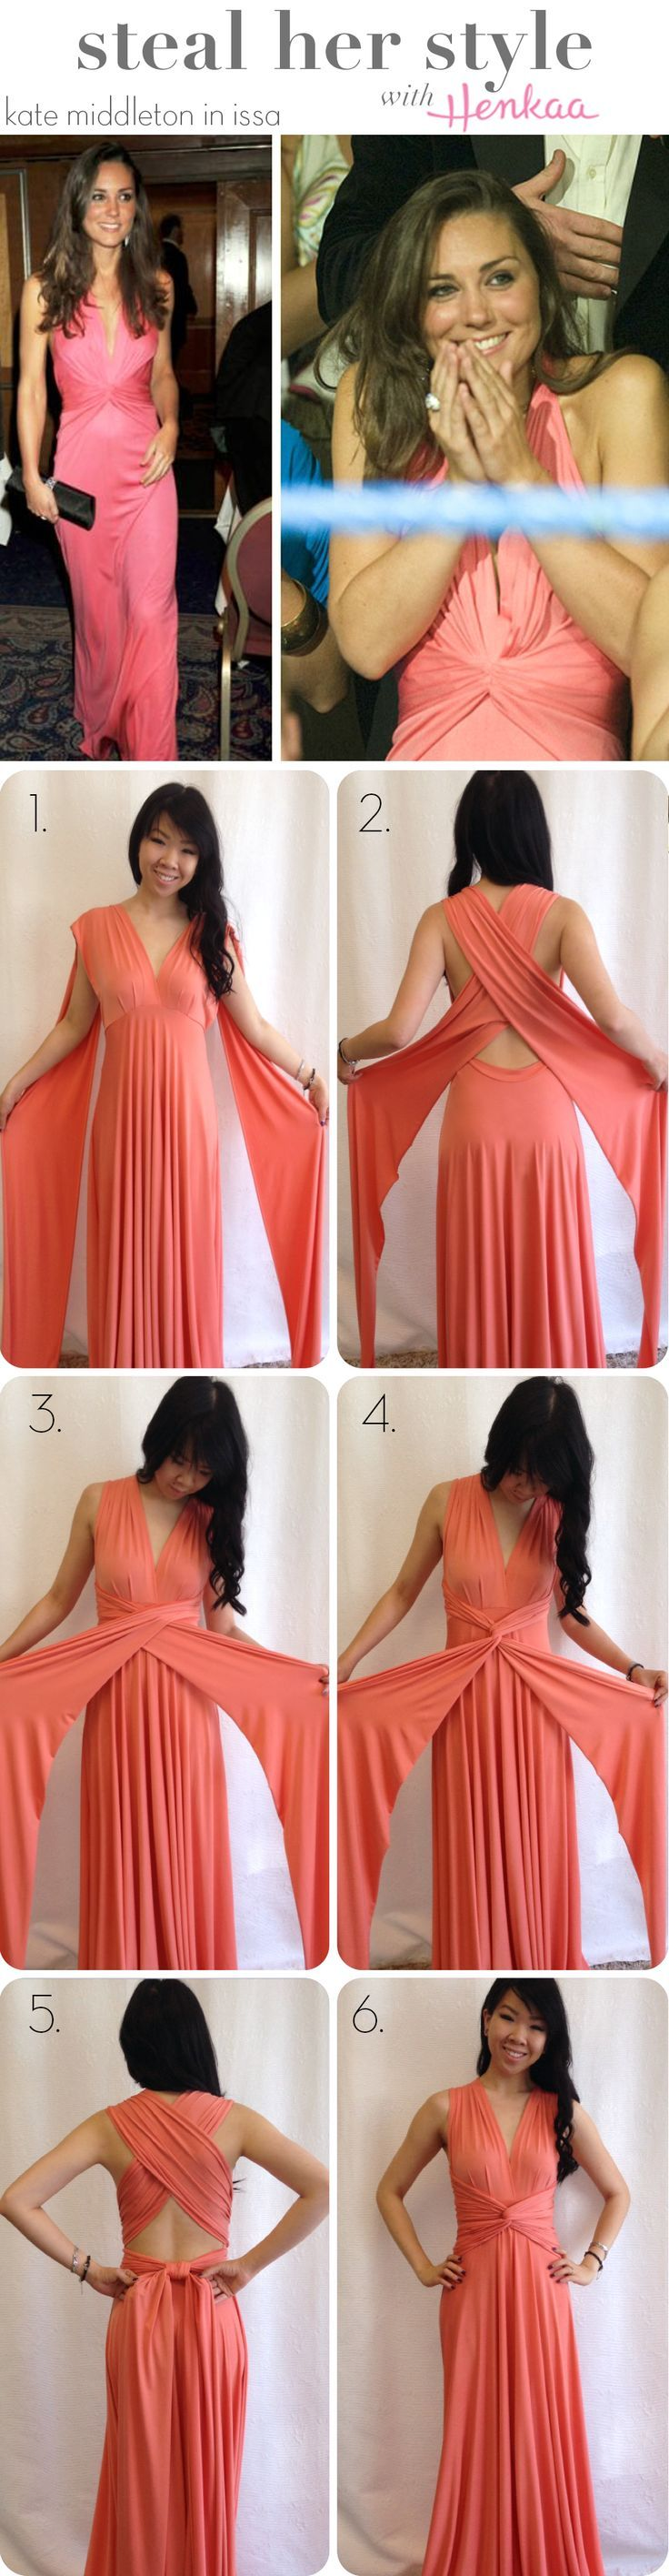 kate middleton infinity dress - Google Search